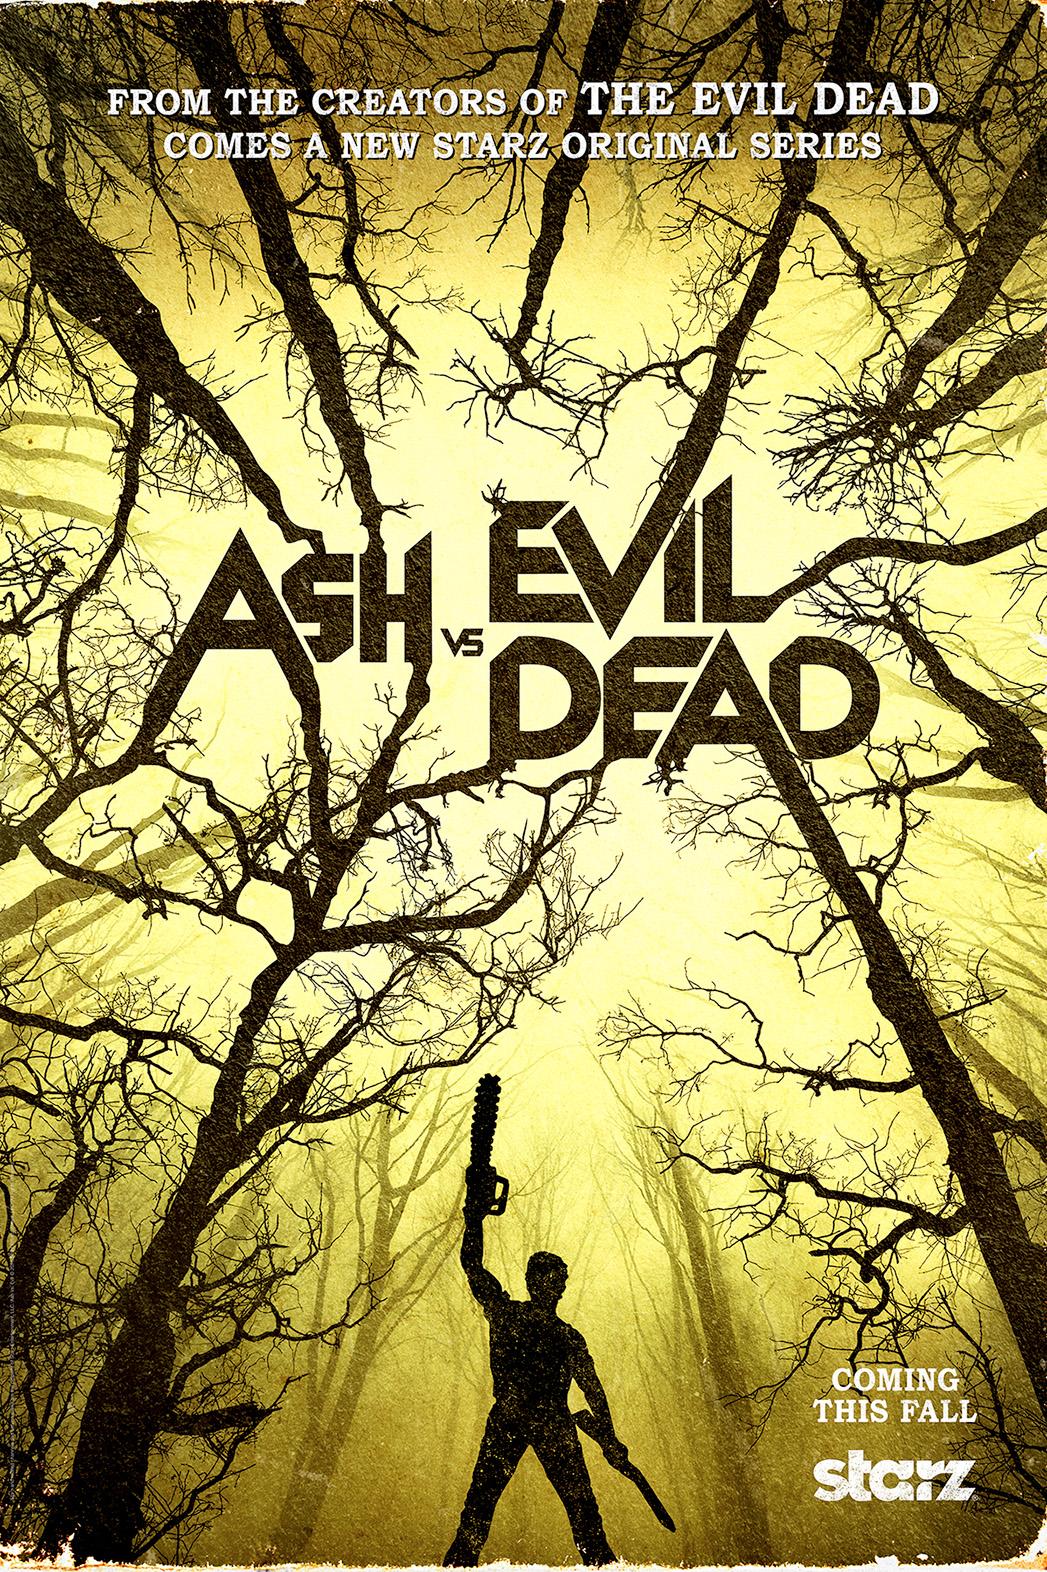 Ash vs. Evil Dead Poster - P 2015